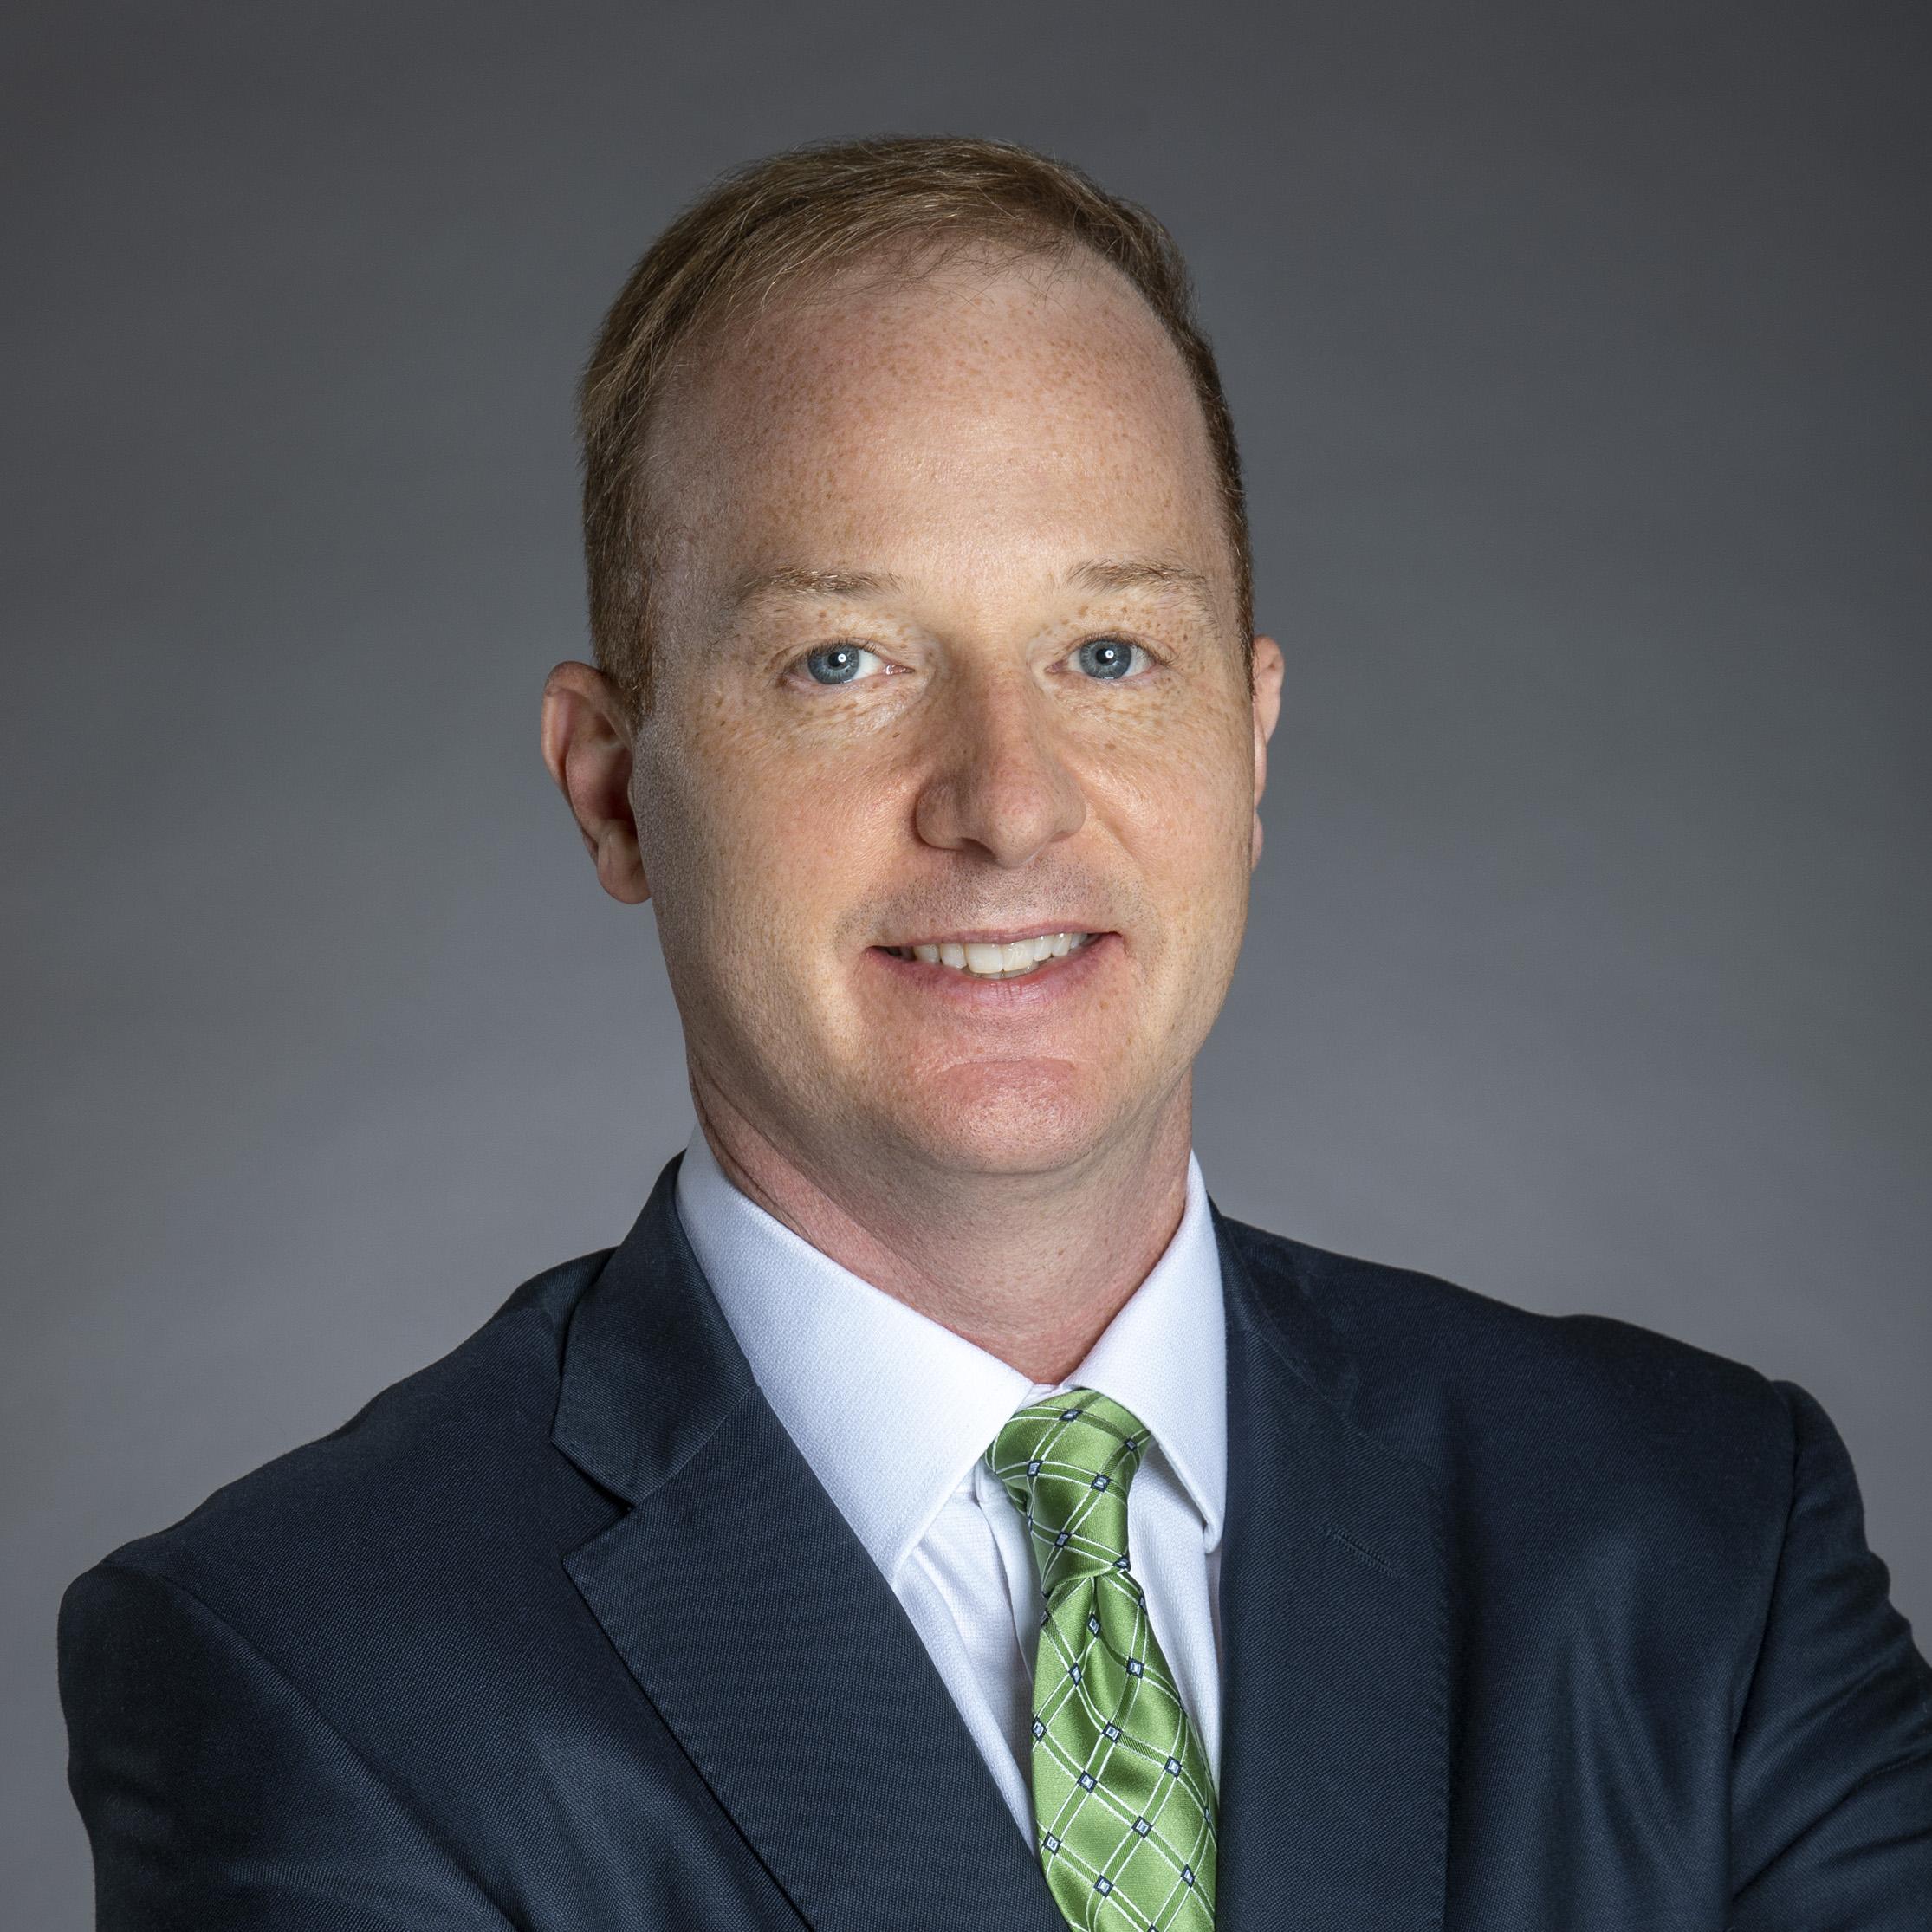 Dan Beuerlein, Chief Development Officer